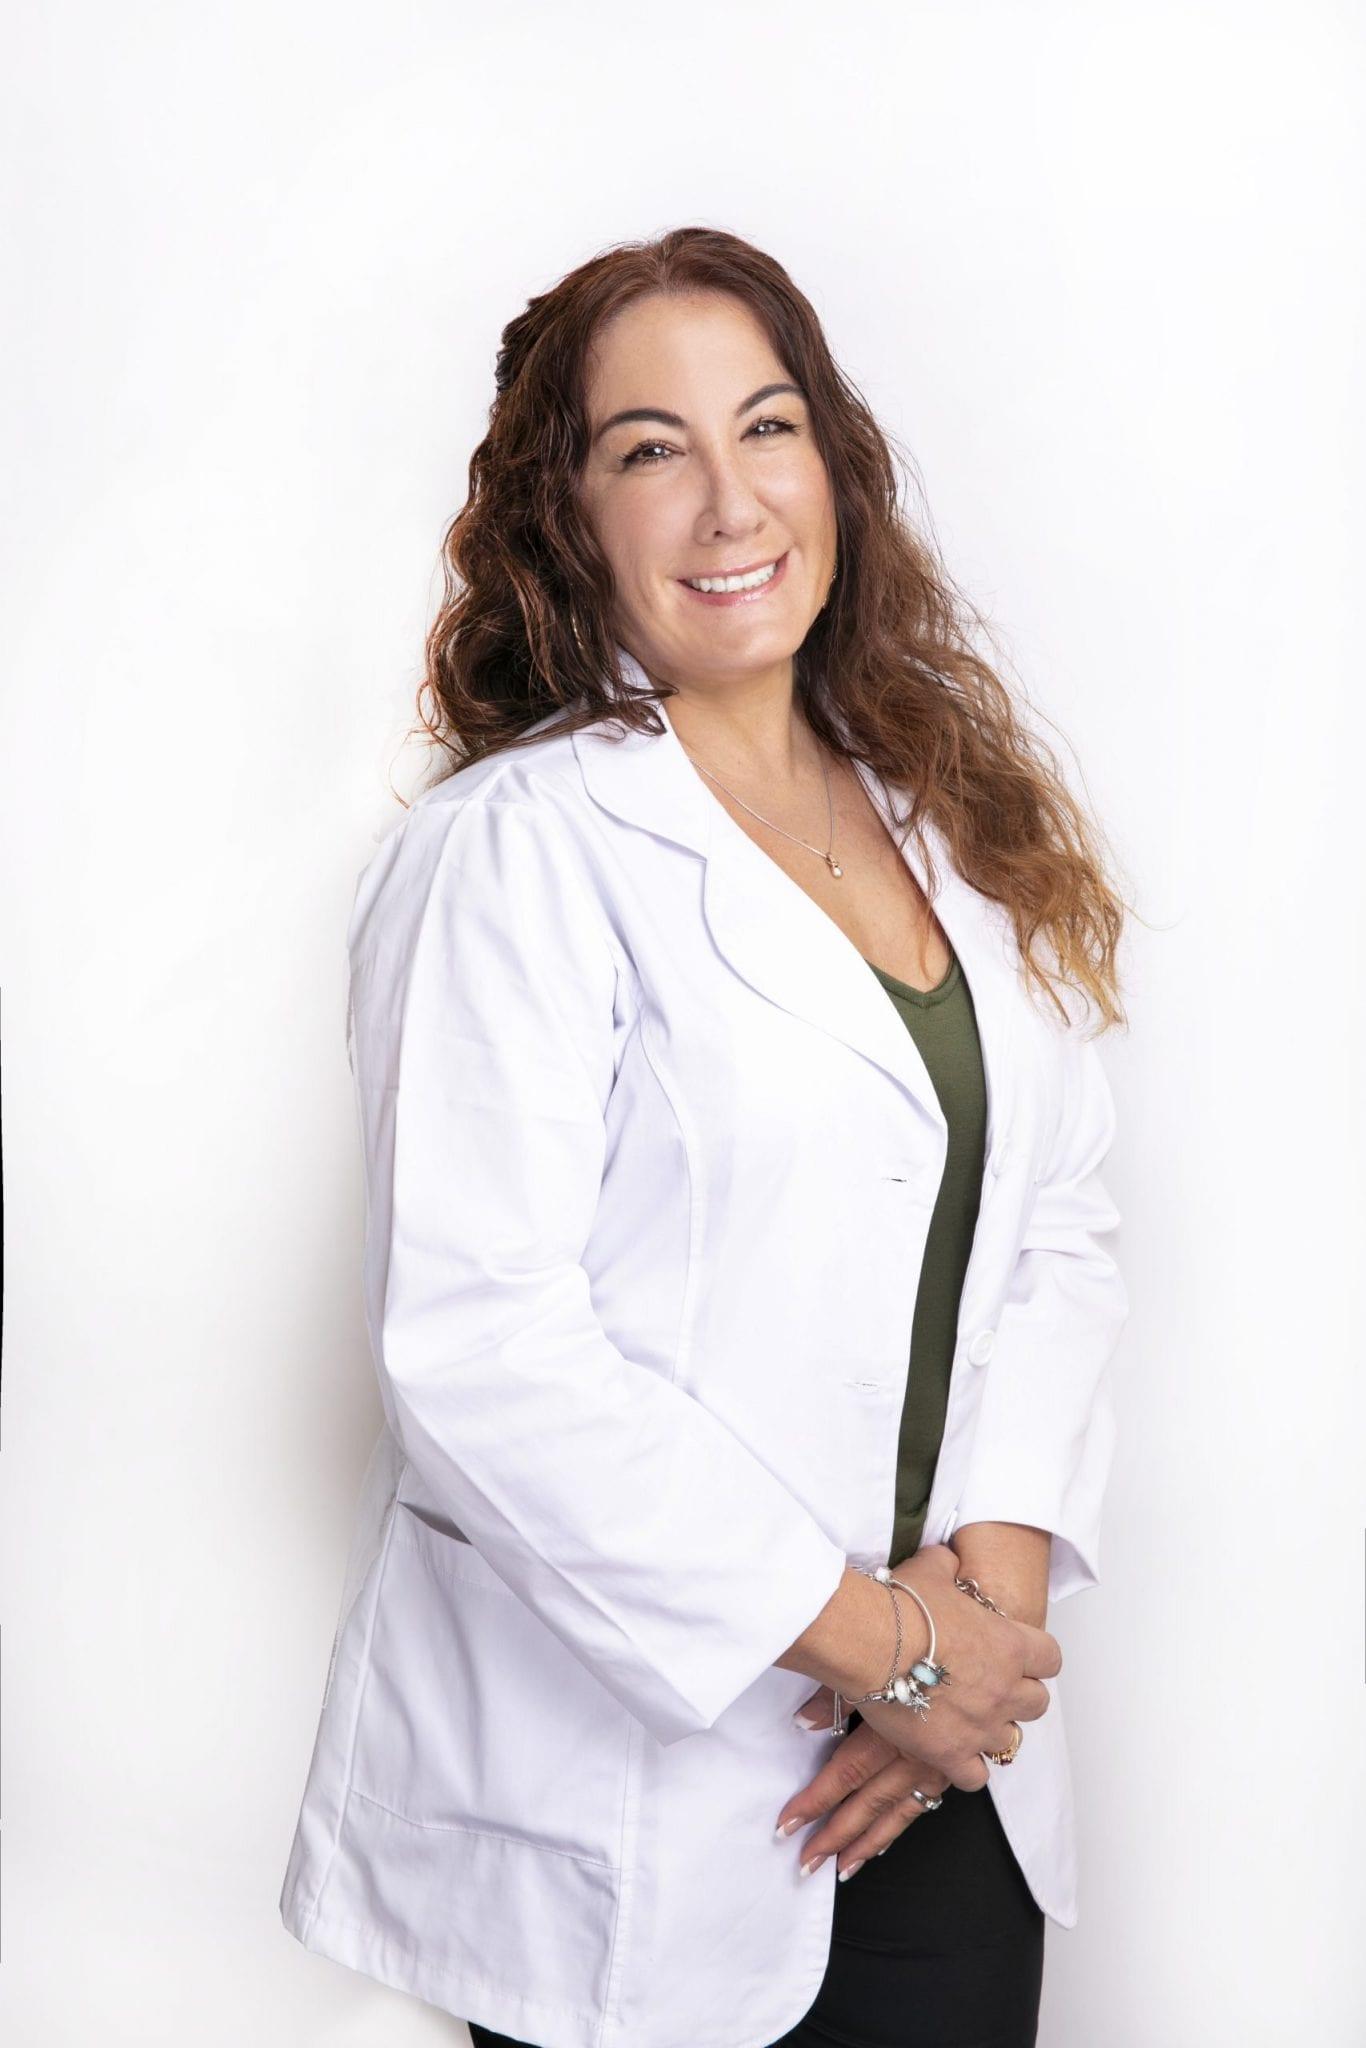 Felicia Montanez, MSN, FNP-C